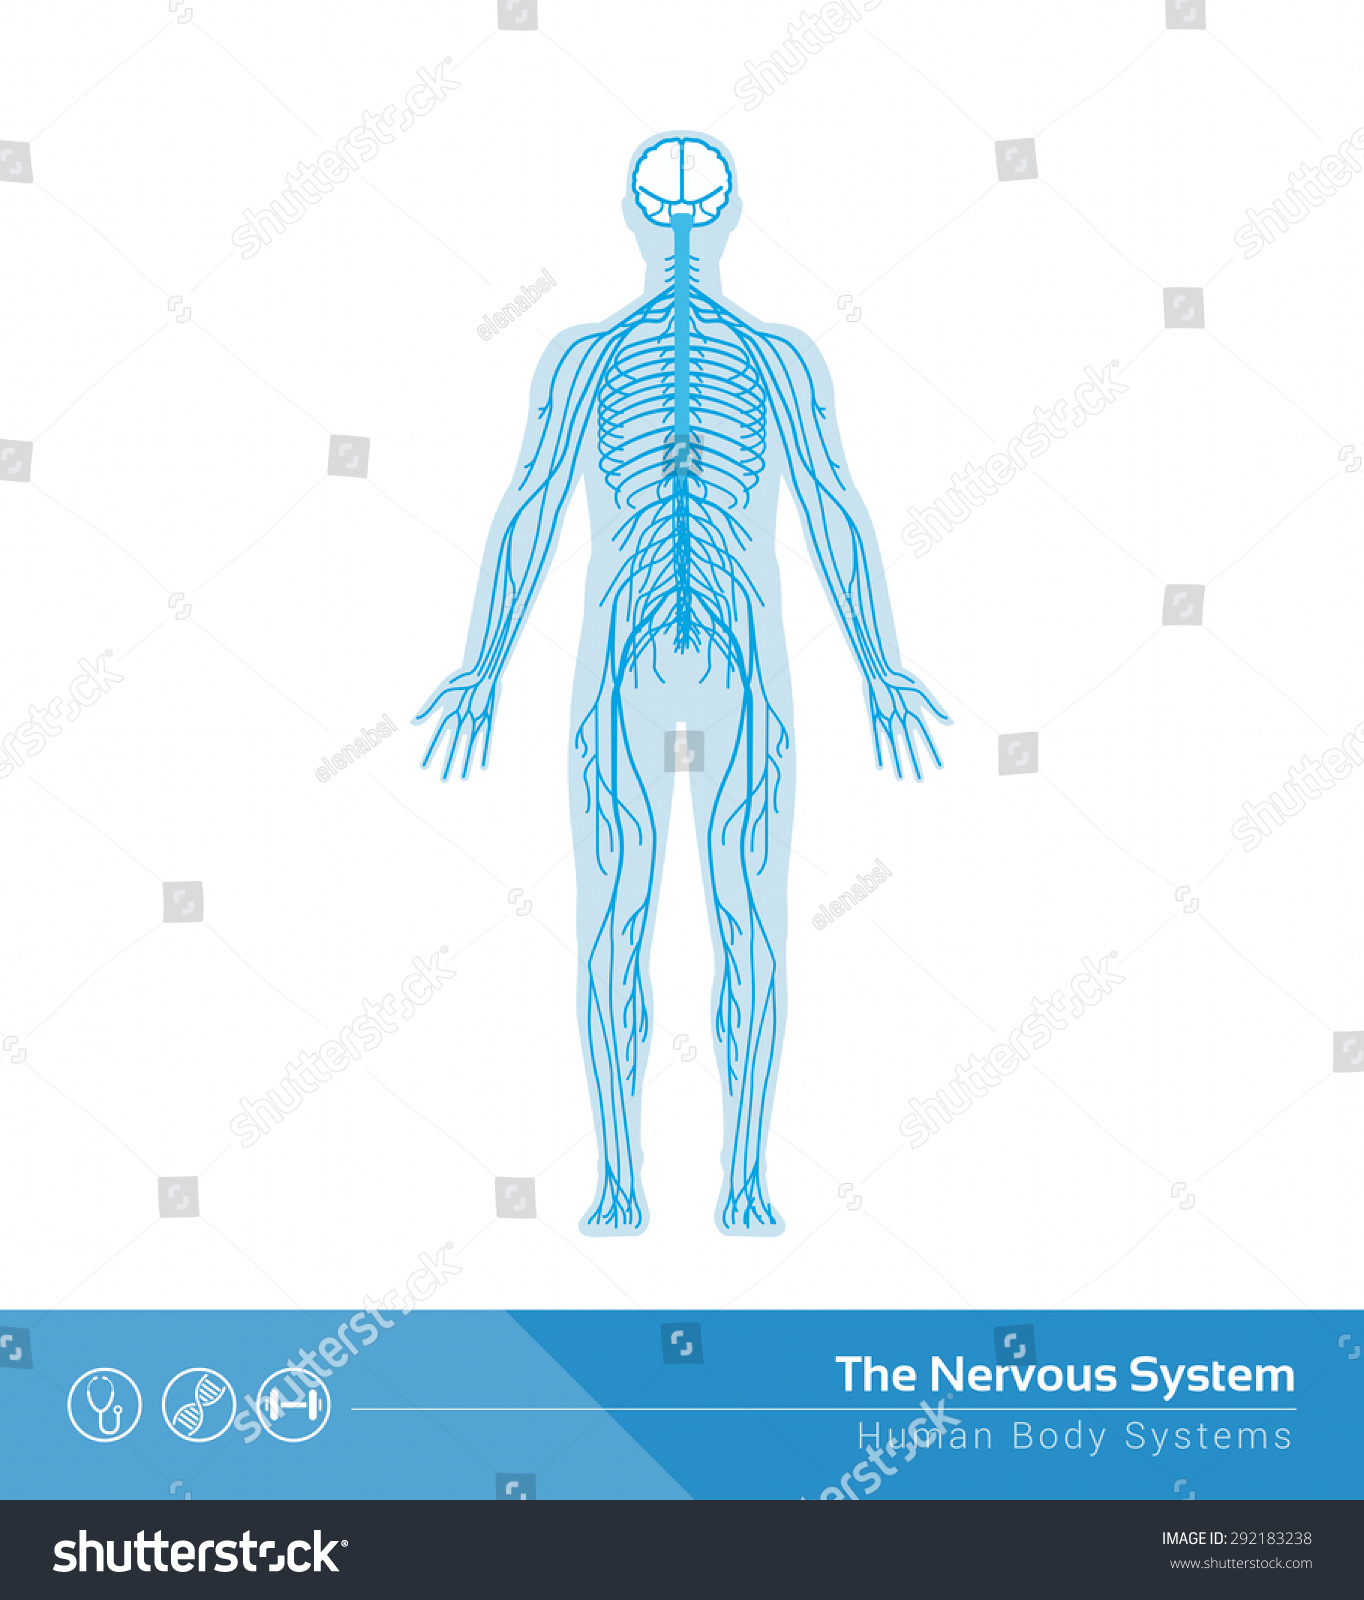 Human Nervous System Vector Medical Illustration Stock Vector